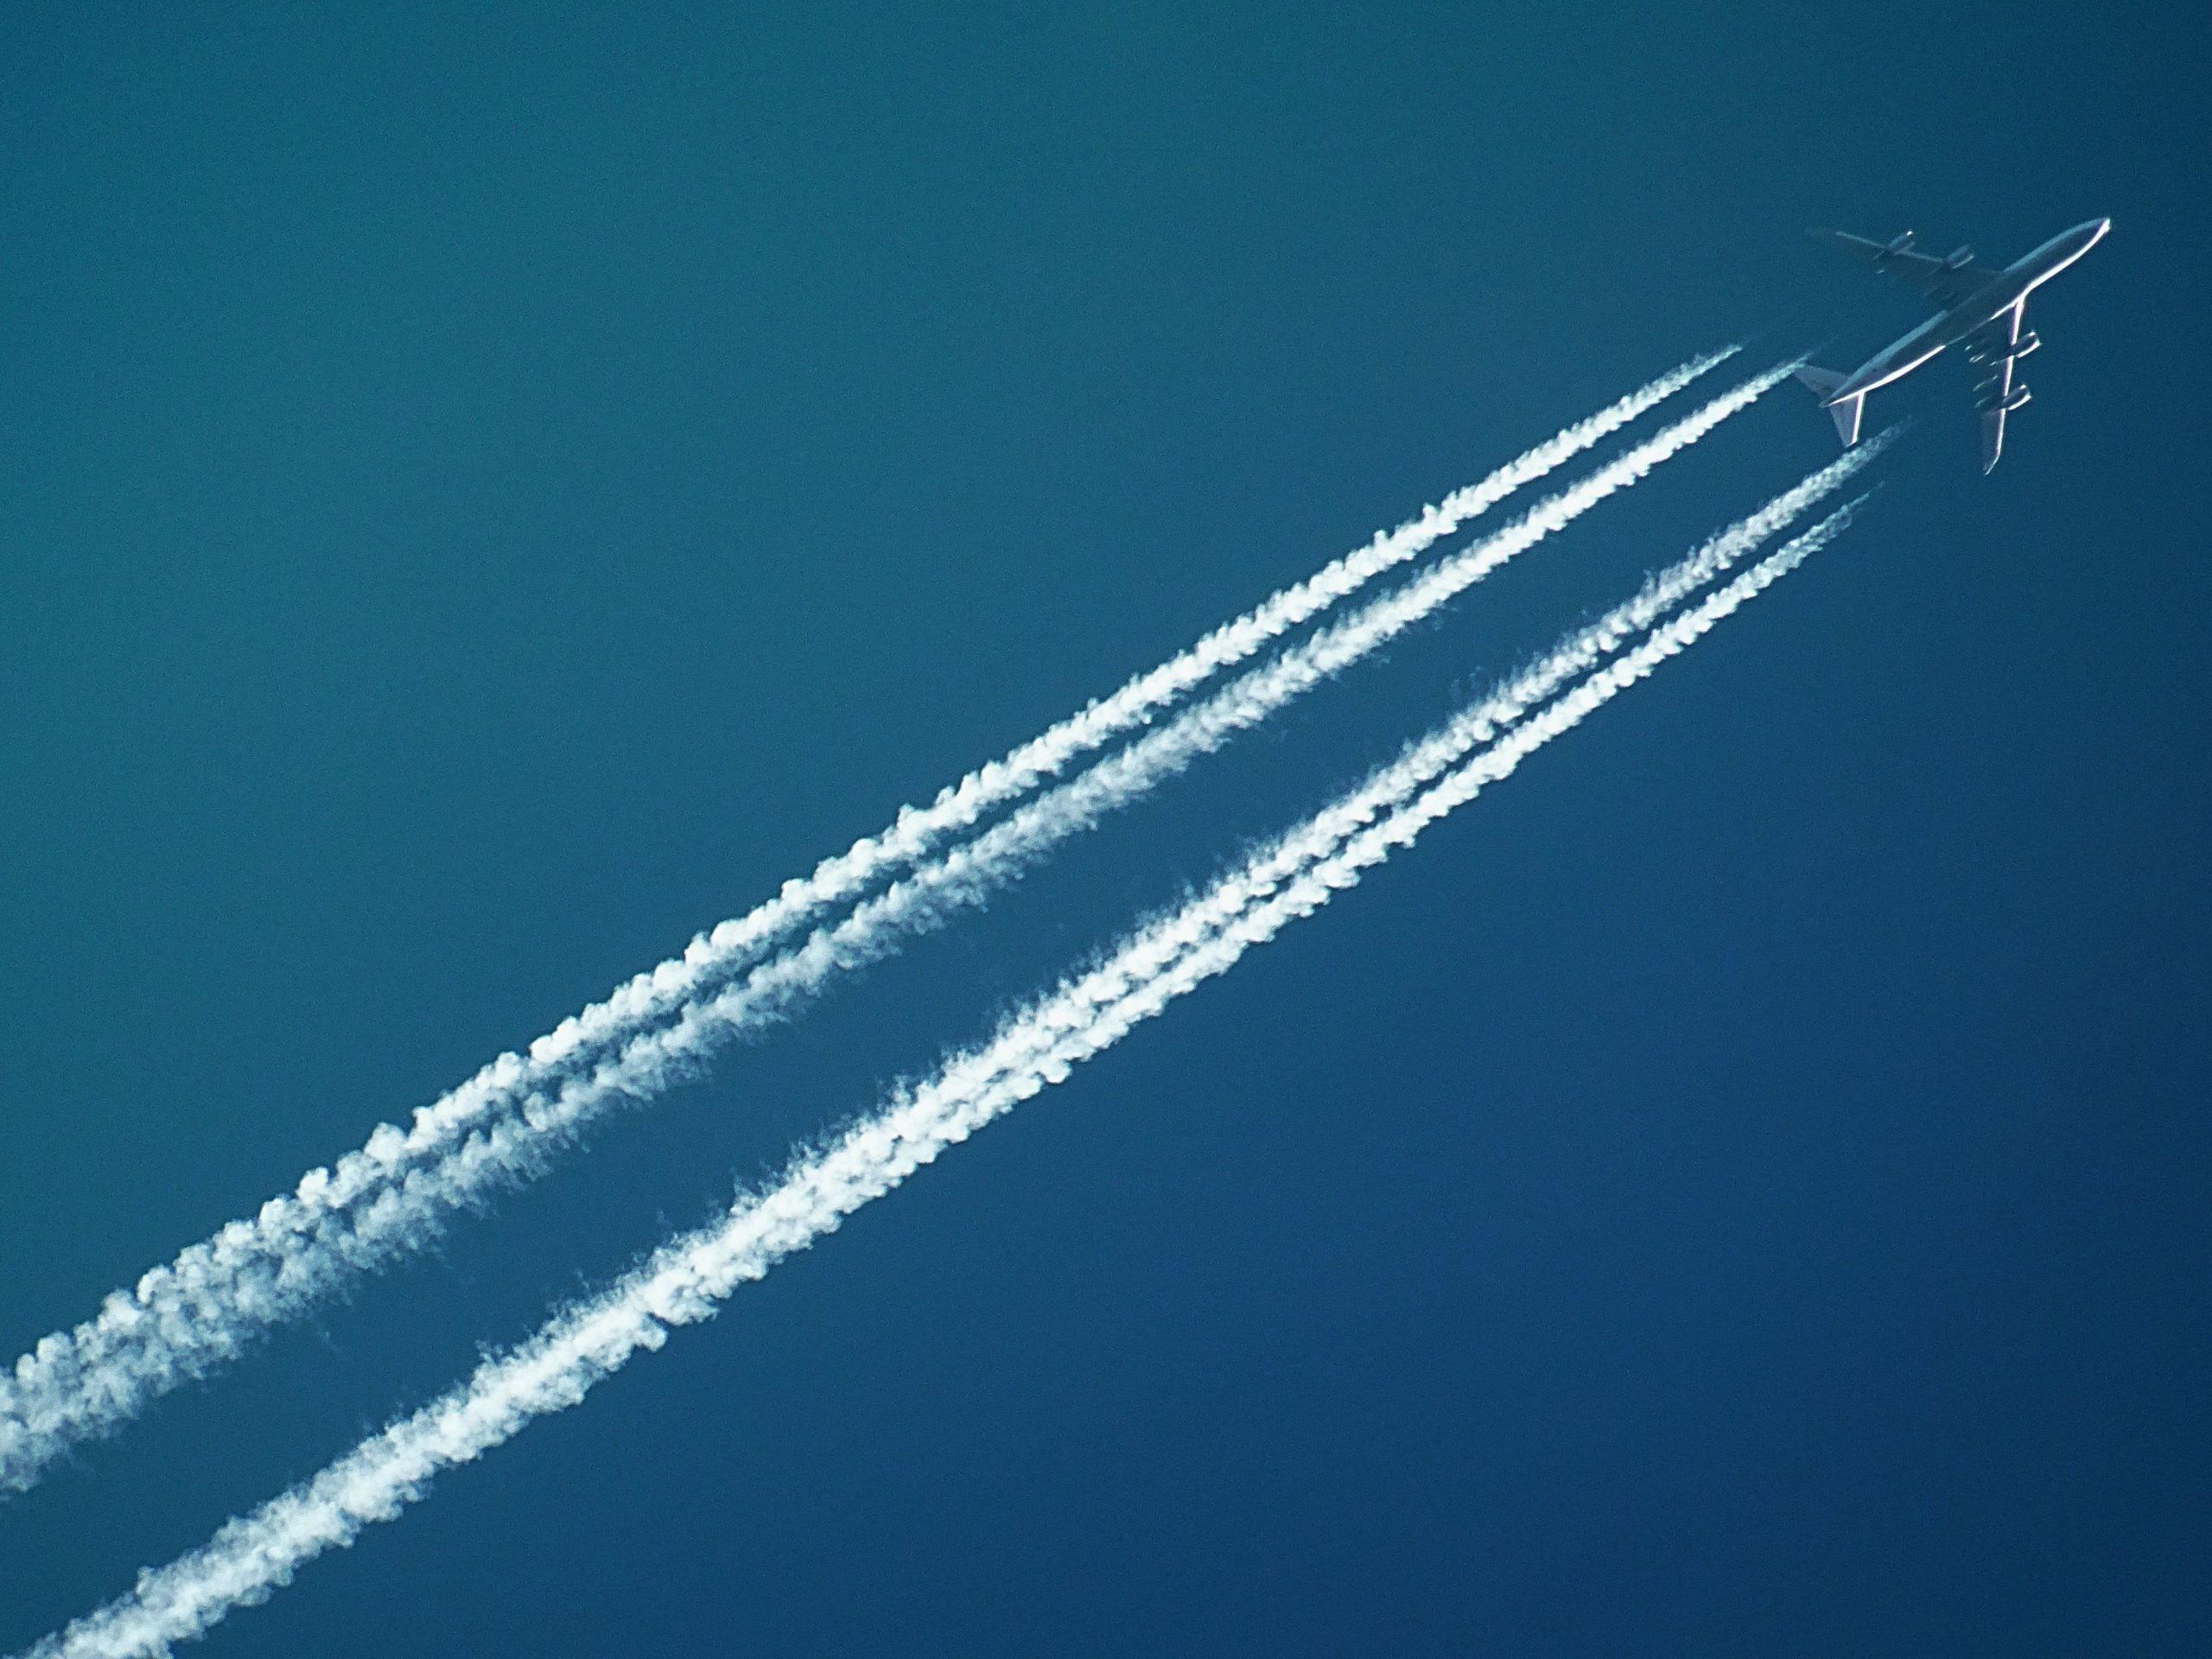 a plane flies across a blue sky with jet streams